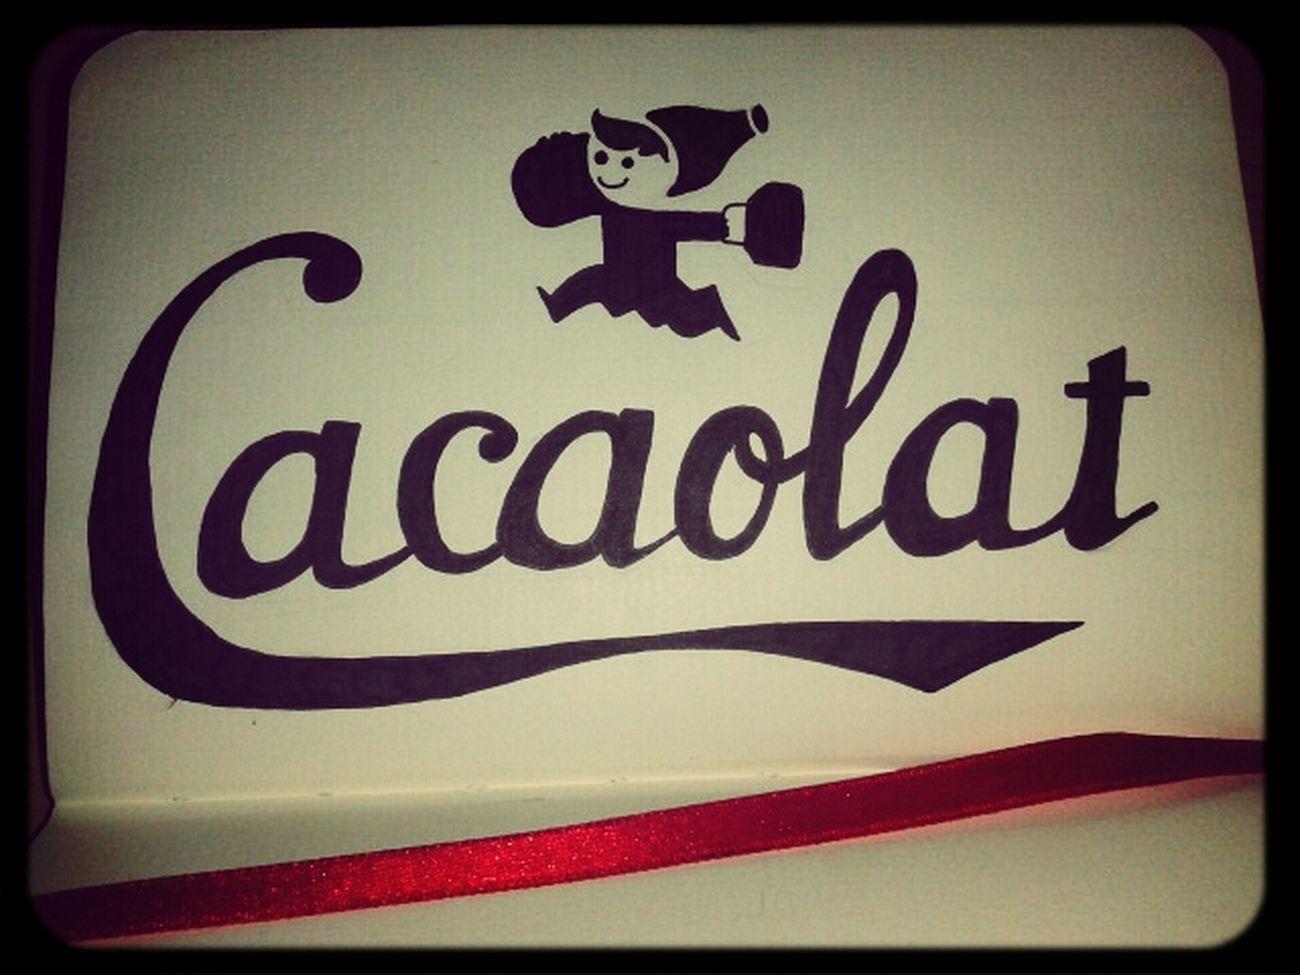 Cacaoltat Logos @anxelaviv